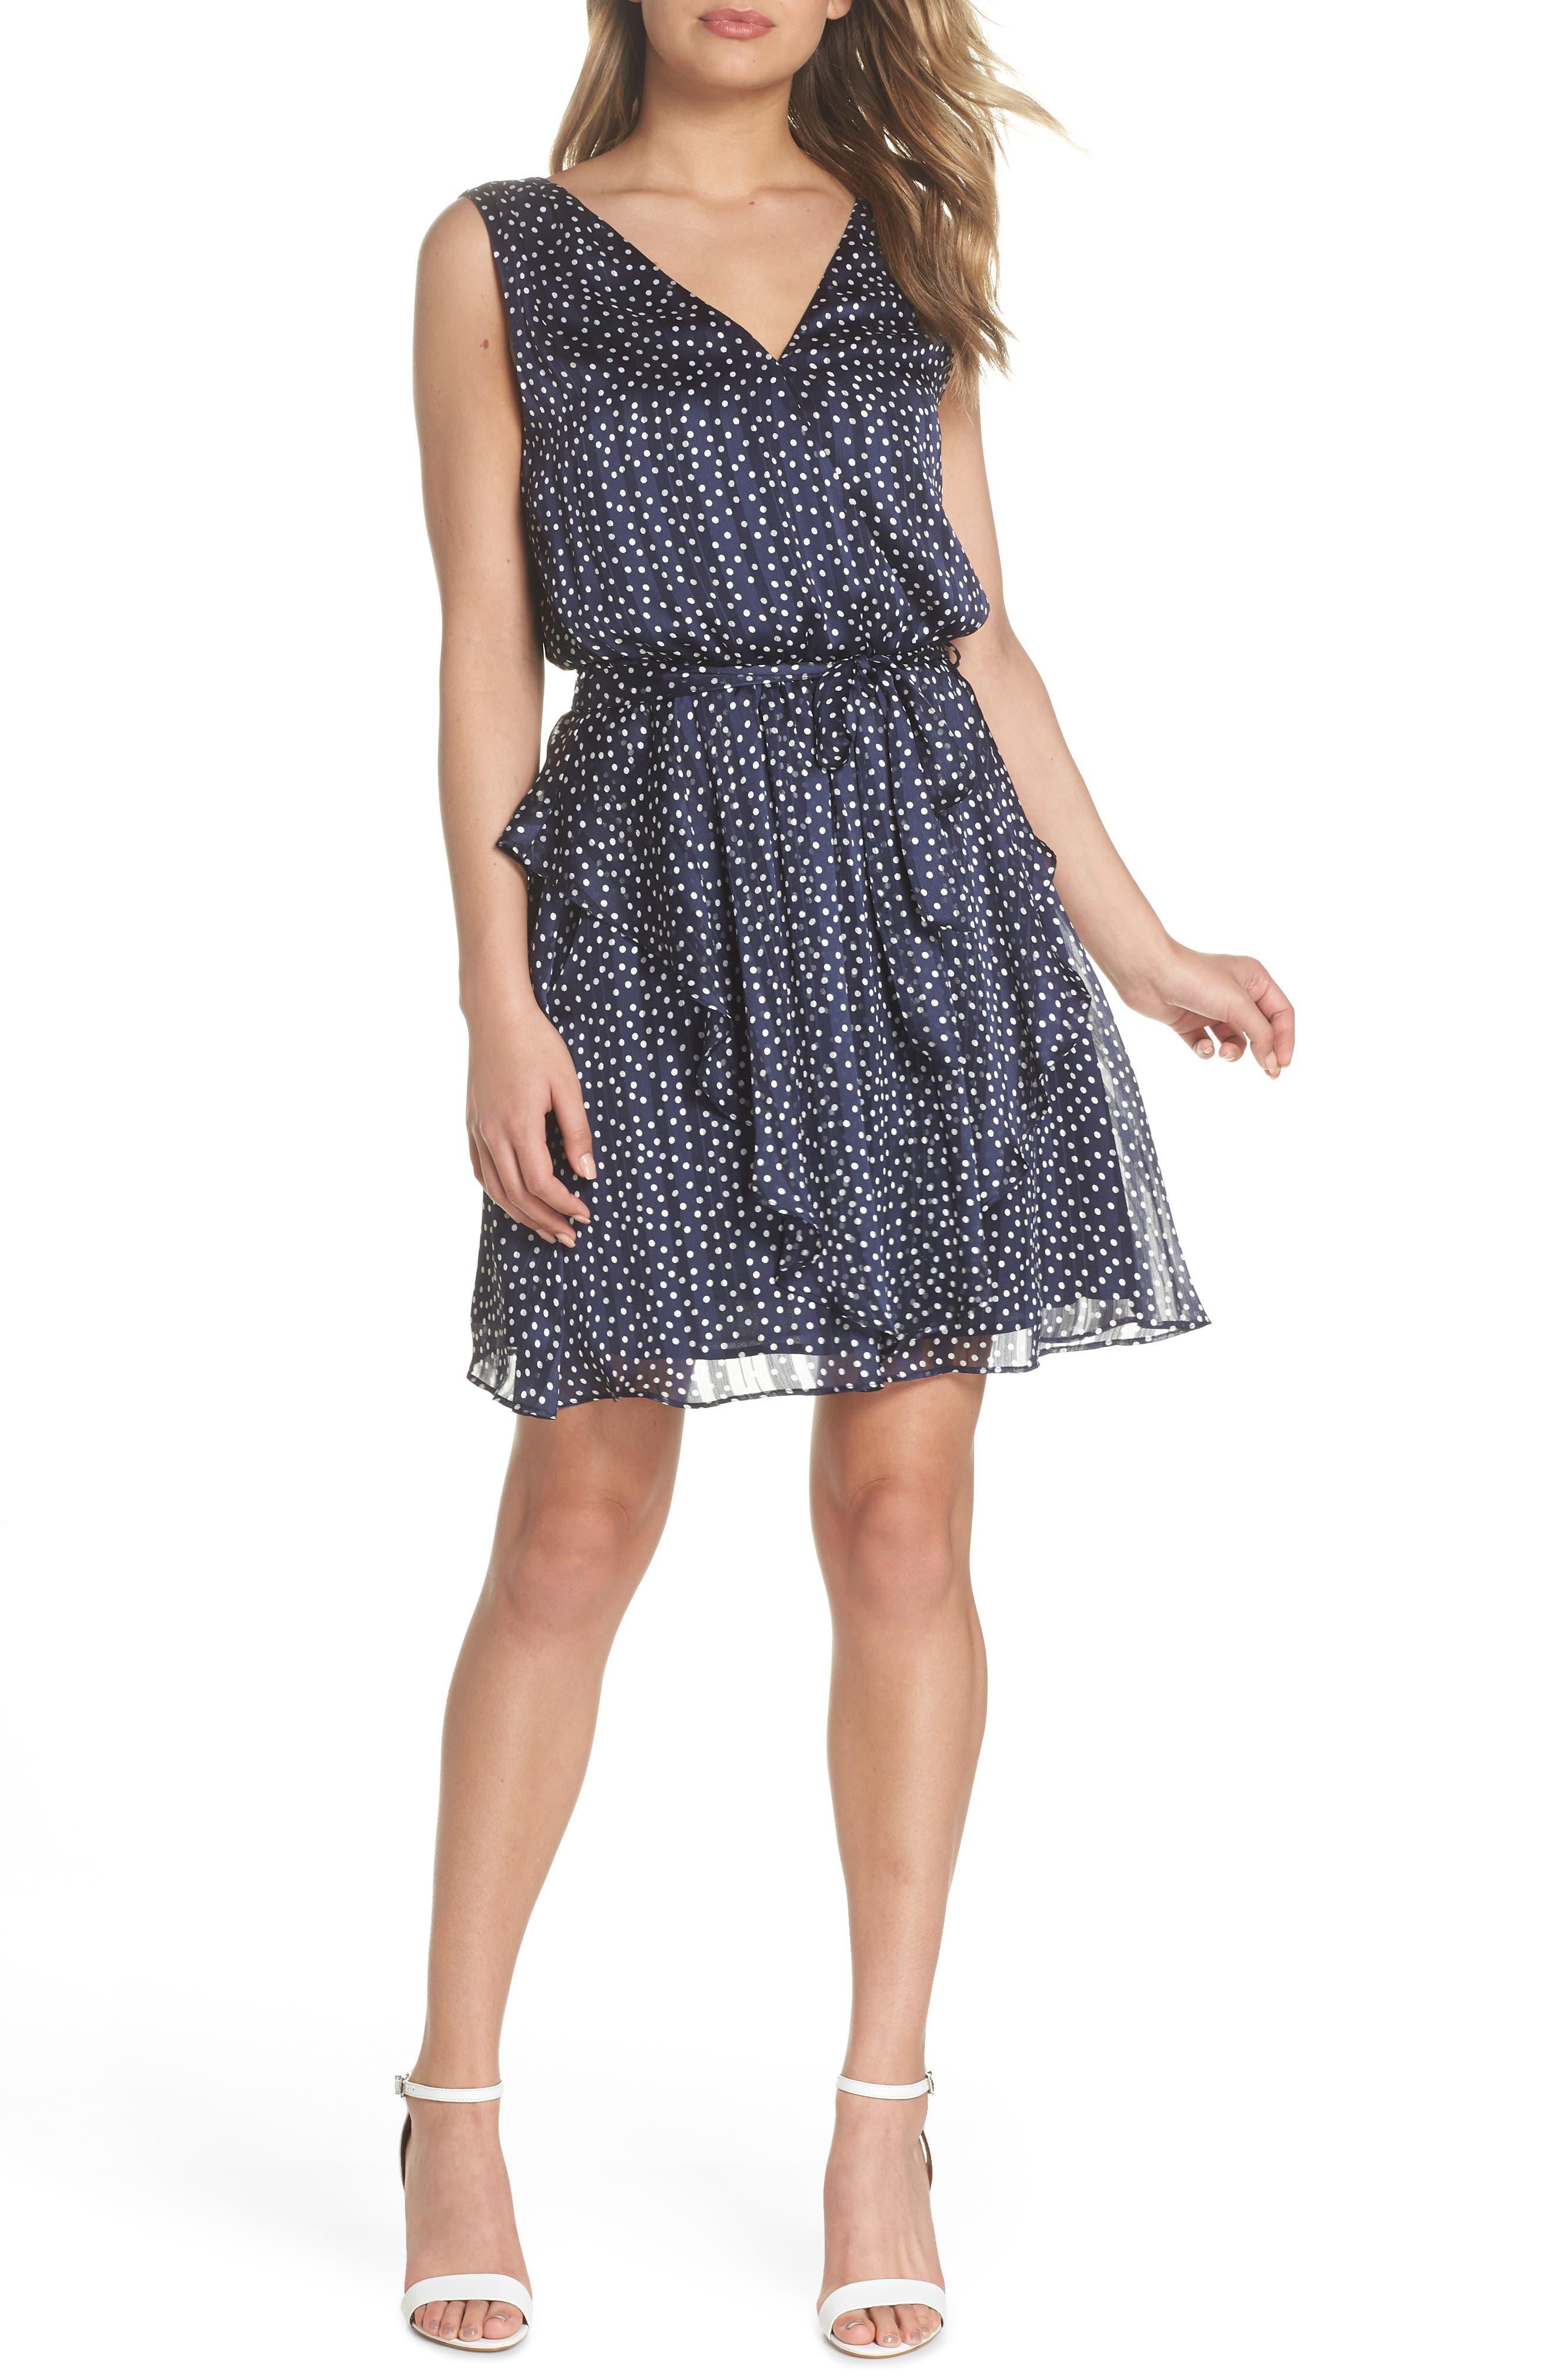 19 Cooper Surplus Polka Dot Tie Waist Chiffon Dress